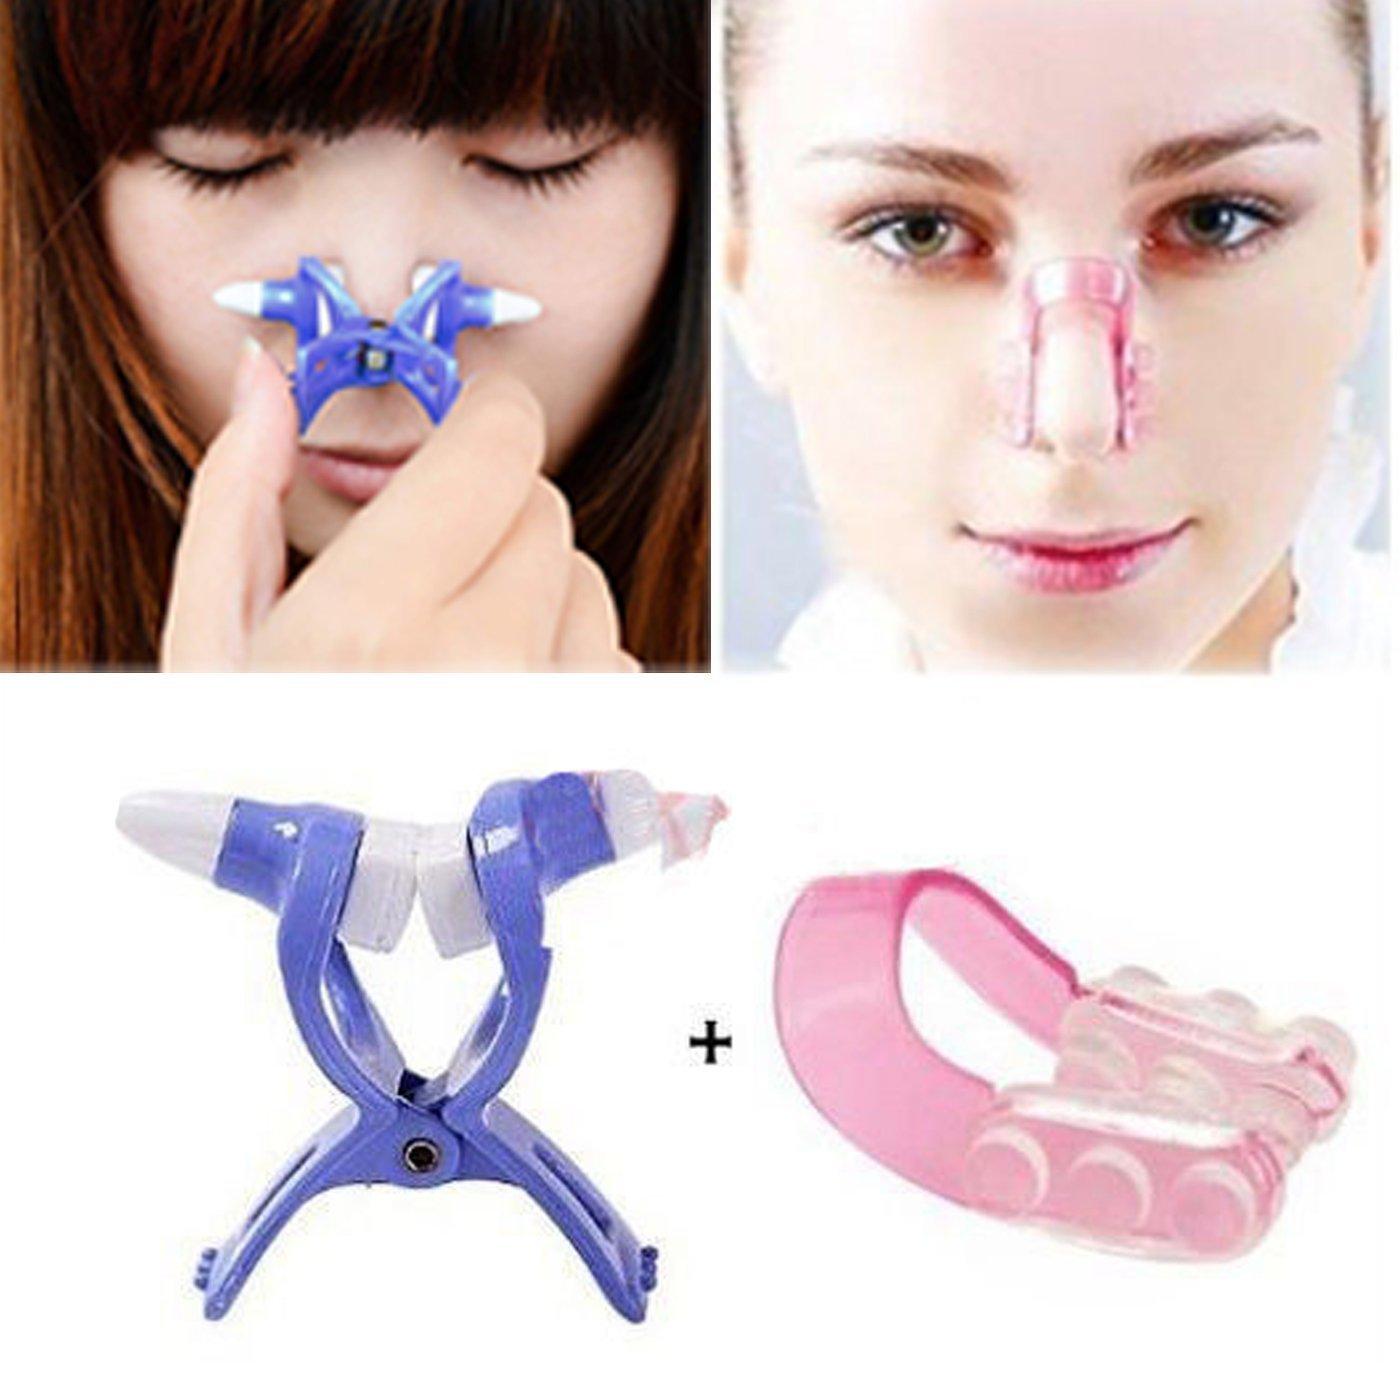 Nasal Bone Remodeling Essence Nose Rise Heighten Up Noseup Pemancung Hidung Luckkyy 2 Piece Shaping Beauty Kit Magic Shapper Lifting Bridge Straightening